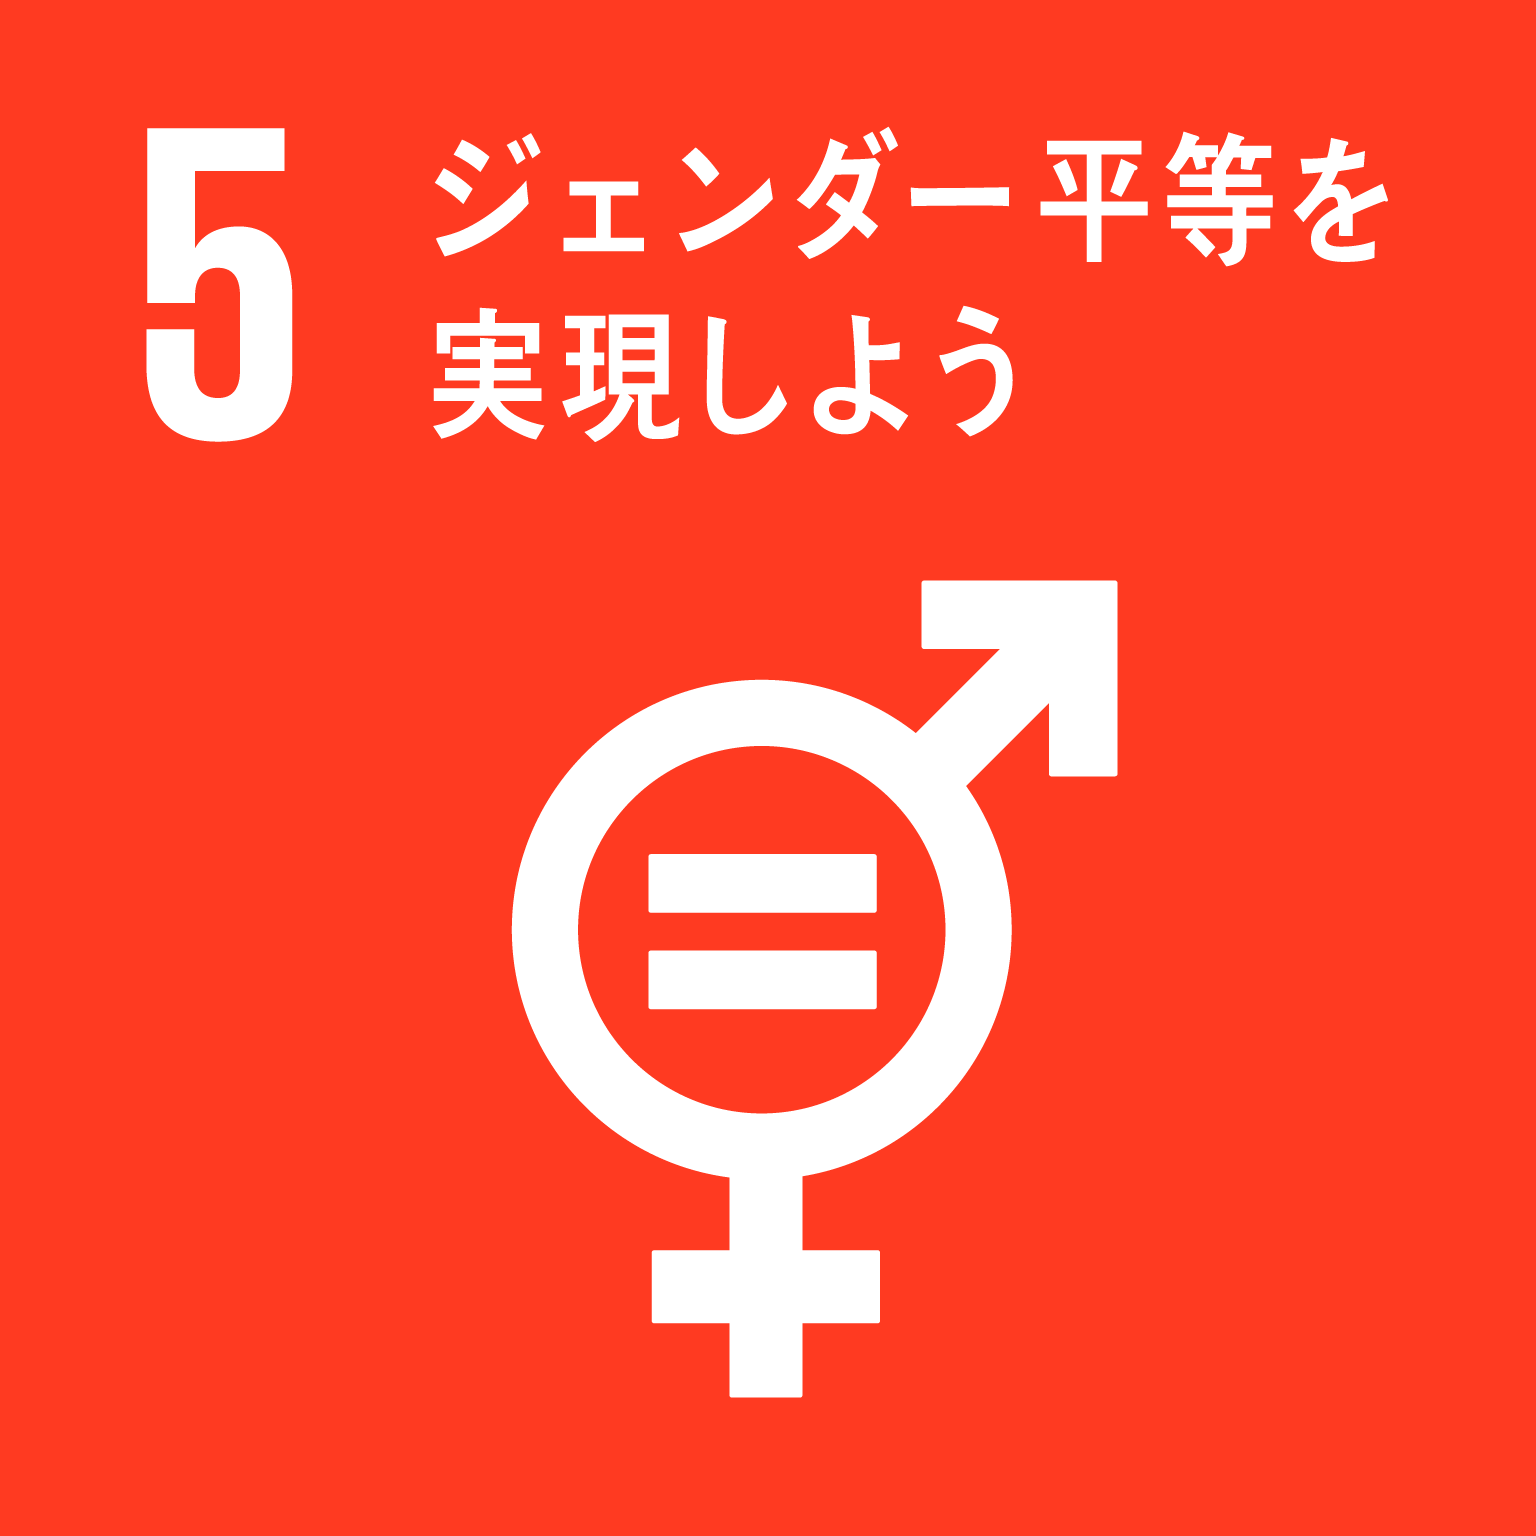 SDGs ジェンダー平等を実現しよう